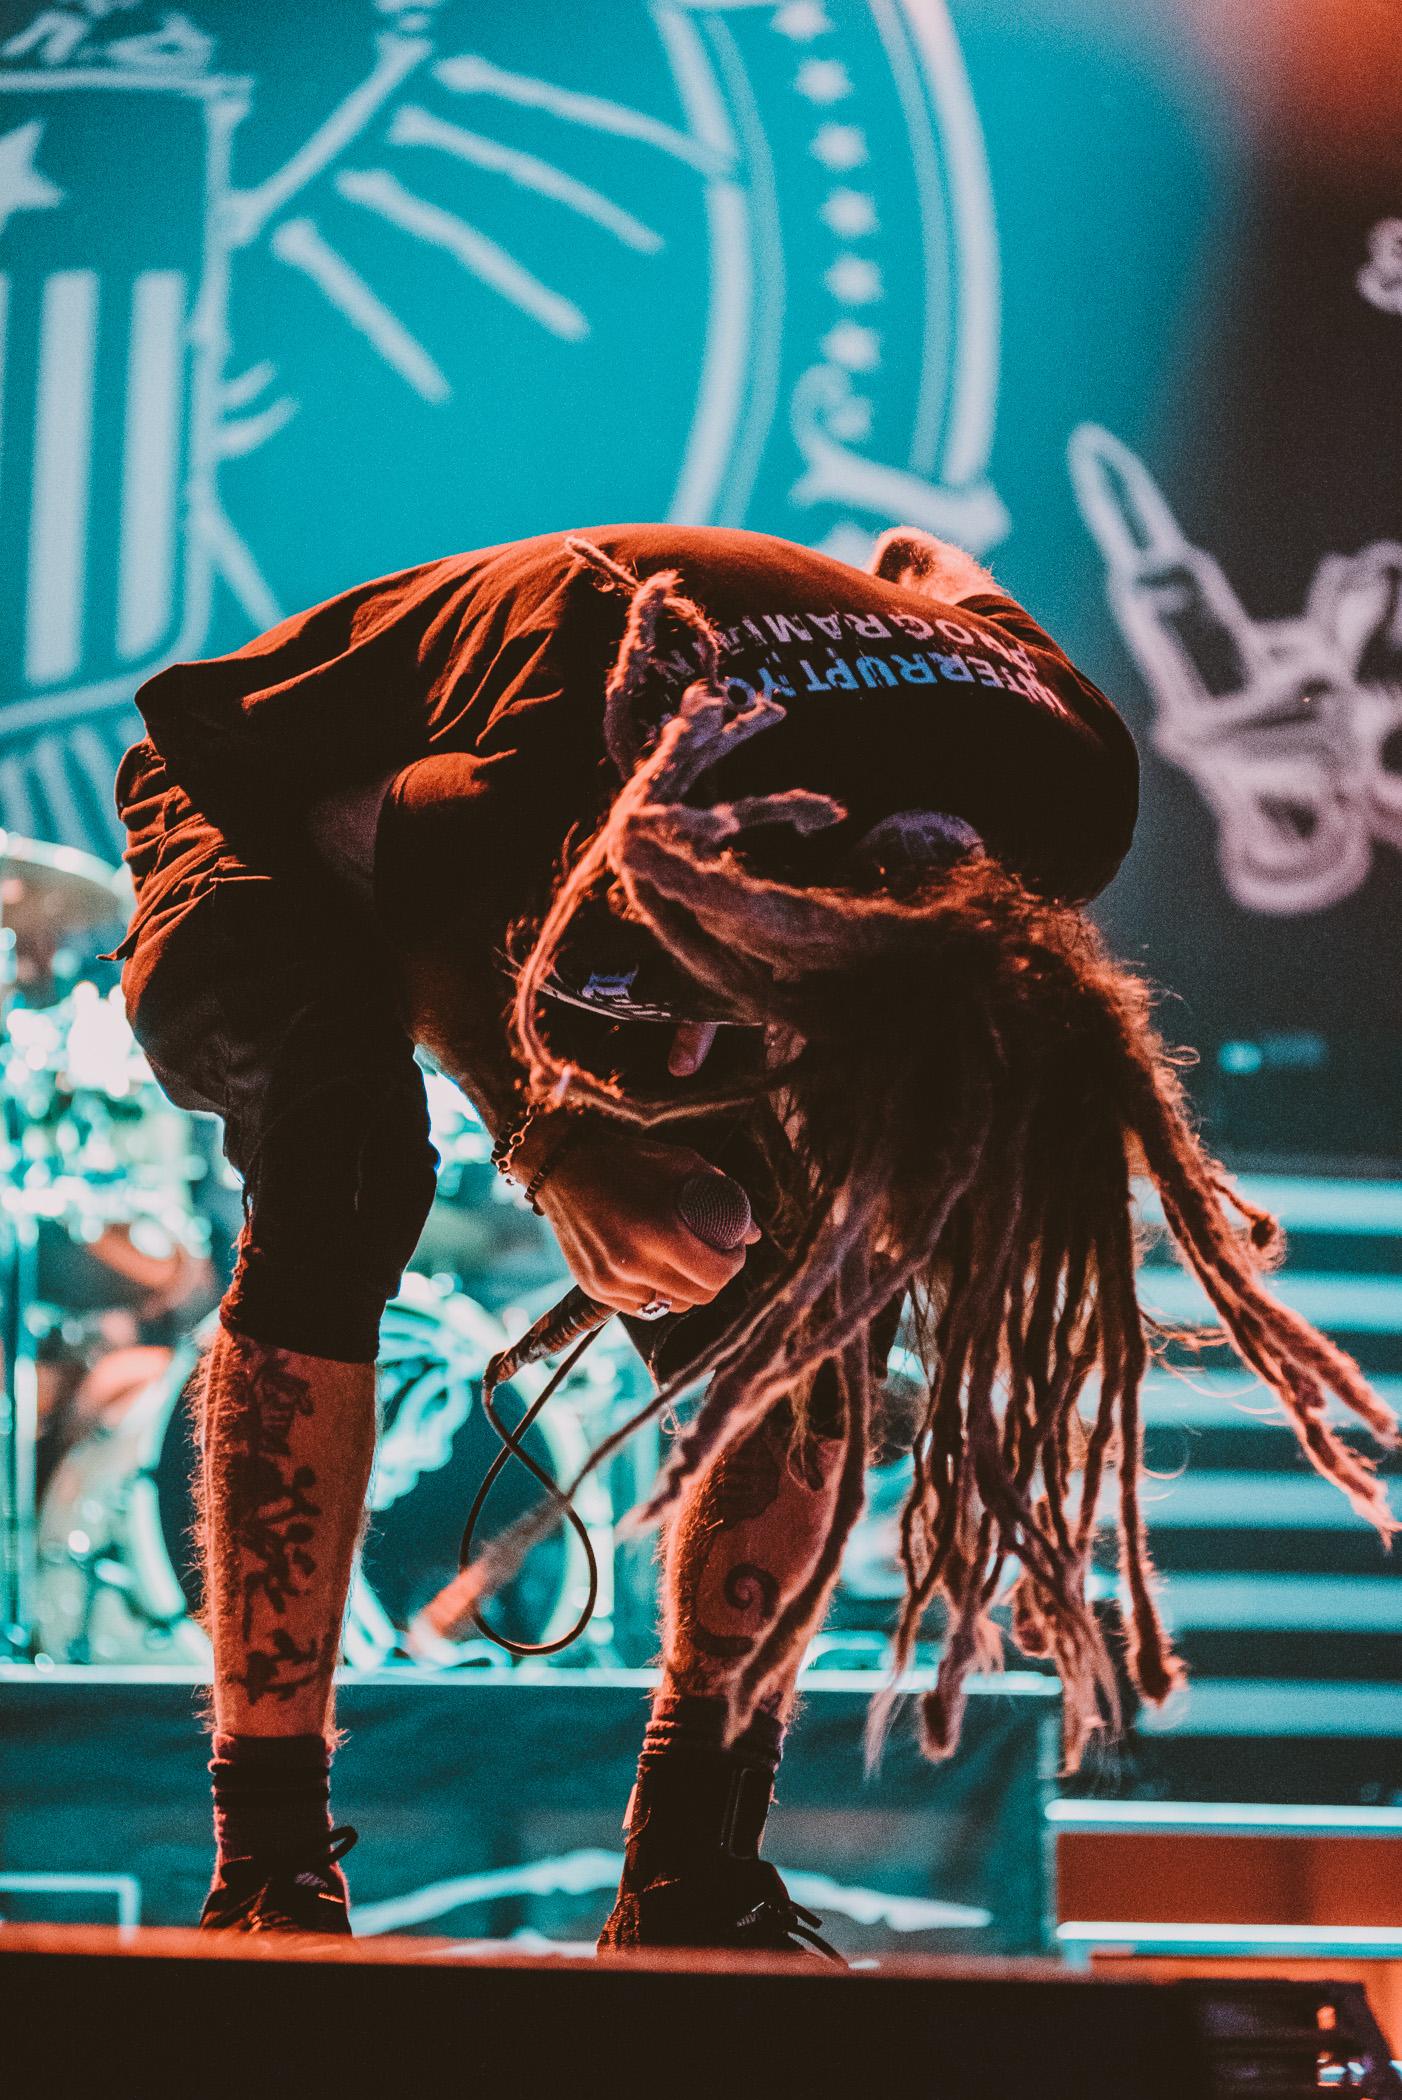 1_Lamb_Of_God-Pacific_Coliseum-Vancouver-Timothy_Nguyen-20180516 (12 of 47).jpg